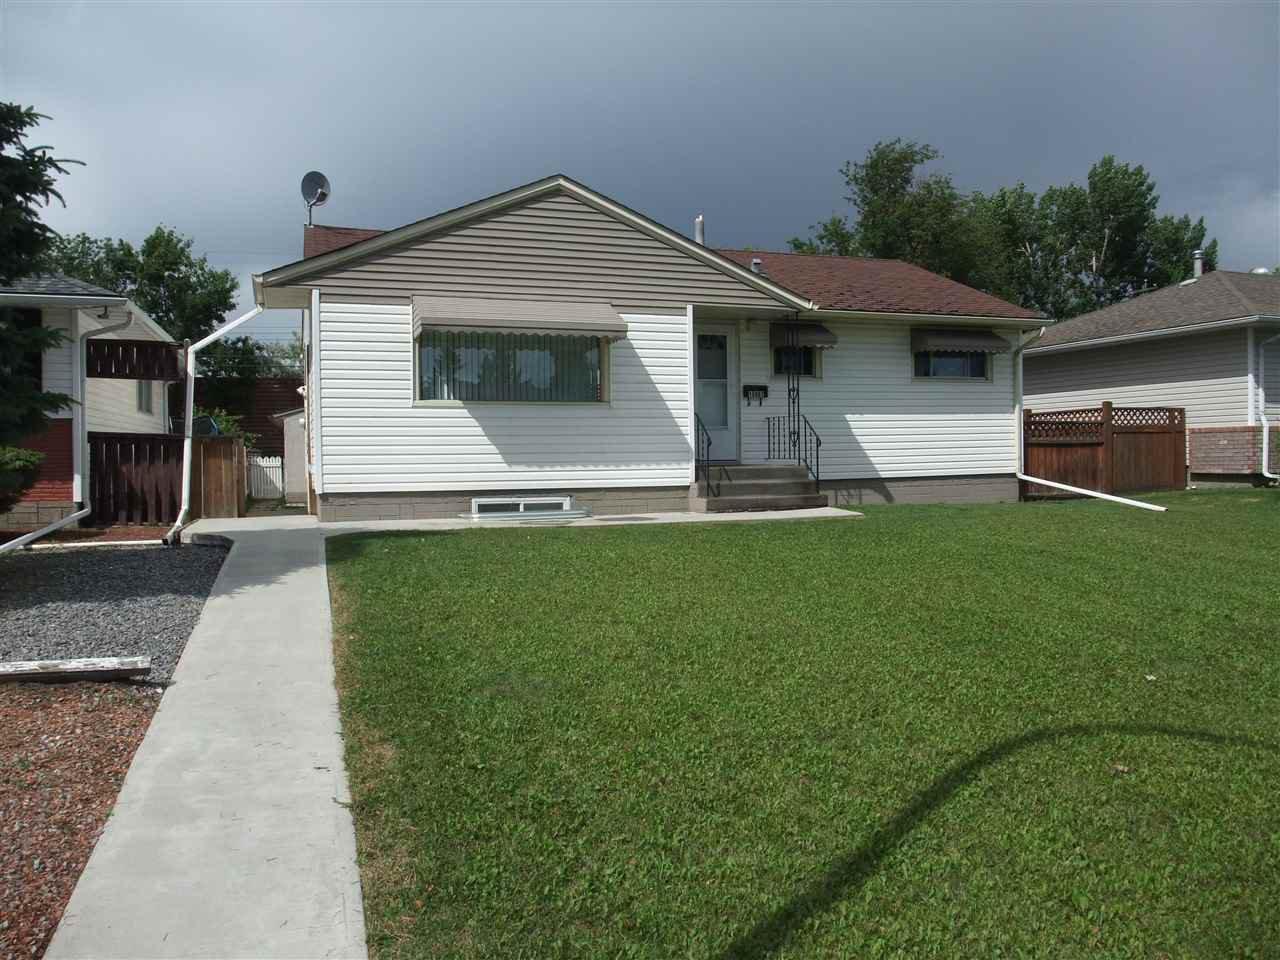 Main Photo:  in Edmonton: Zone 21 House for sale : MLS®# E4205301